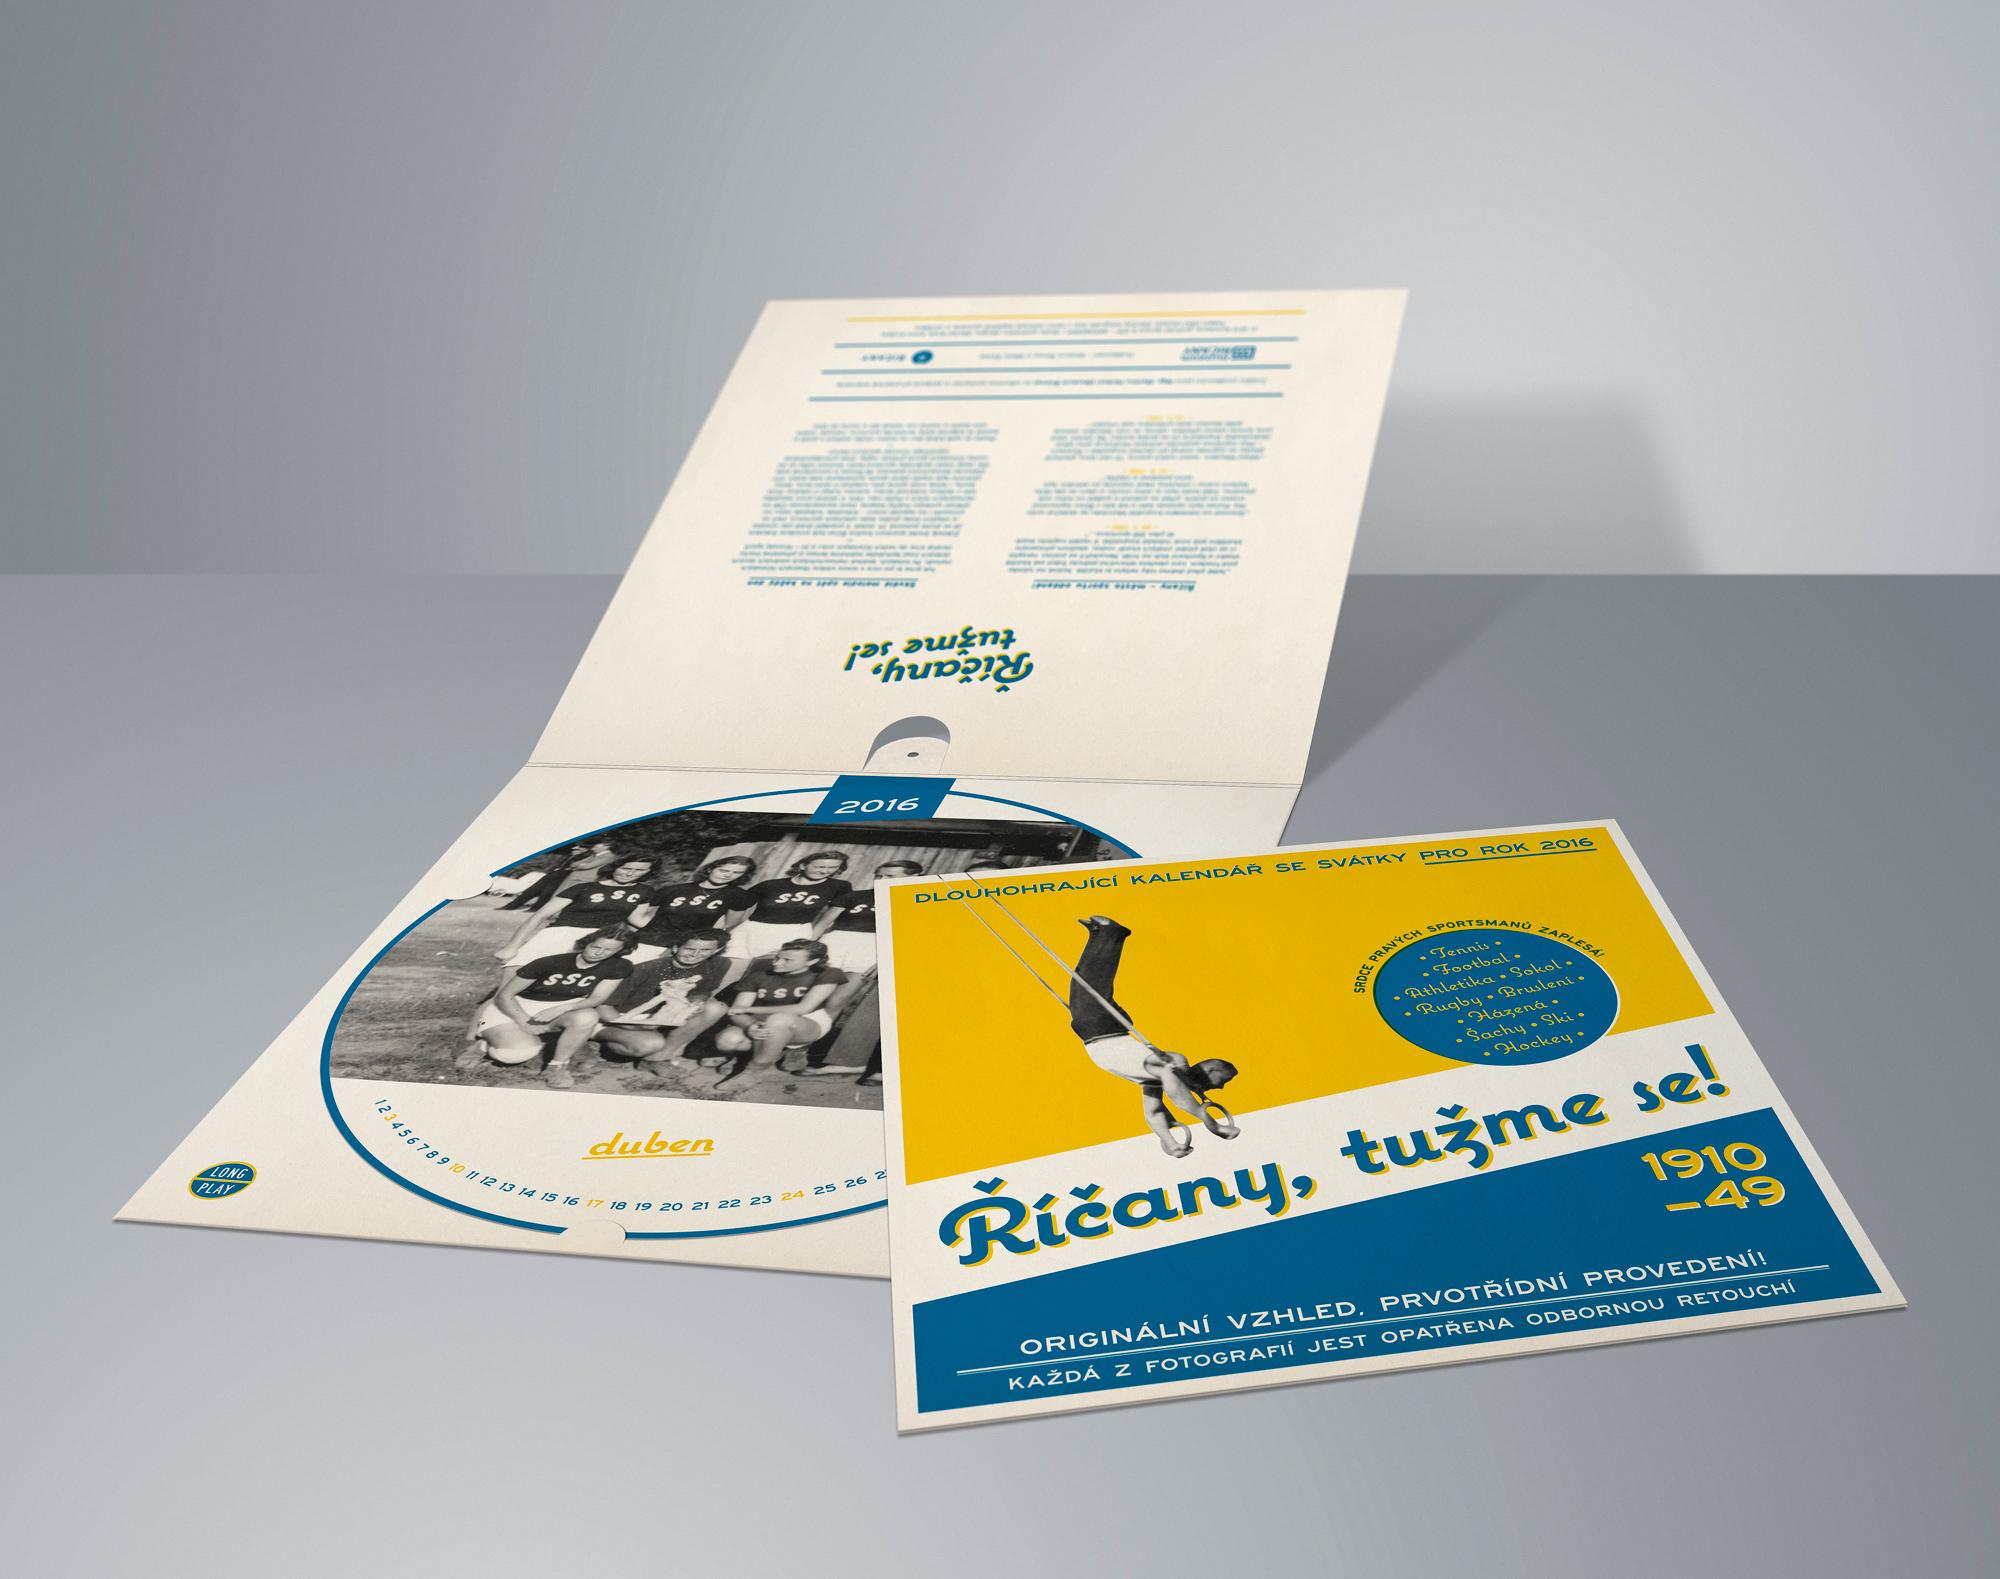 [album/Products_Model_Product/91/Ricany_kalendar_obal_vizualizace_2.jpg]